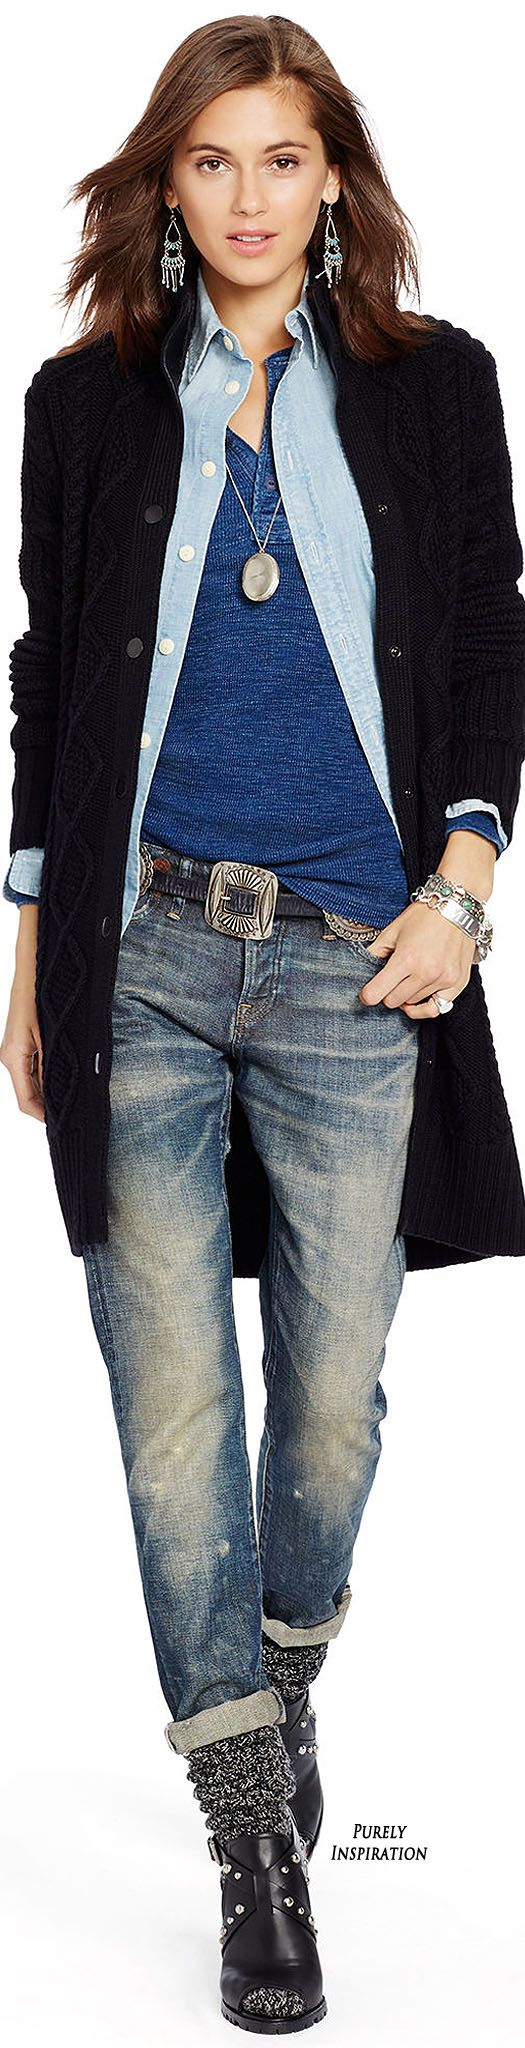 Super Cheap! polo ralph lauren outlet! Press picture link get it immediately… Clothing, Shoes & Jewelry - Women - women's belts - http://amzn.to/2kwF6LI